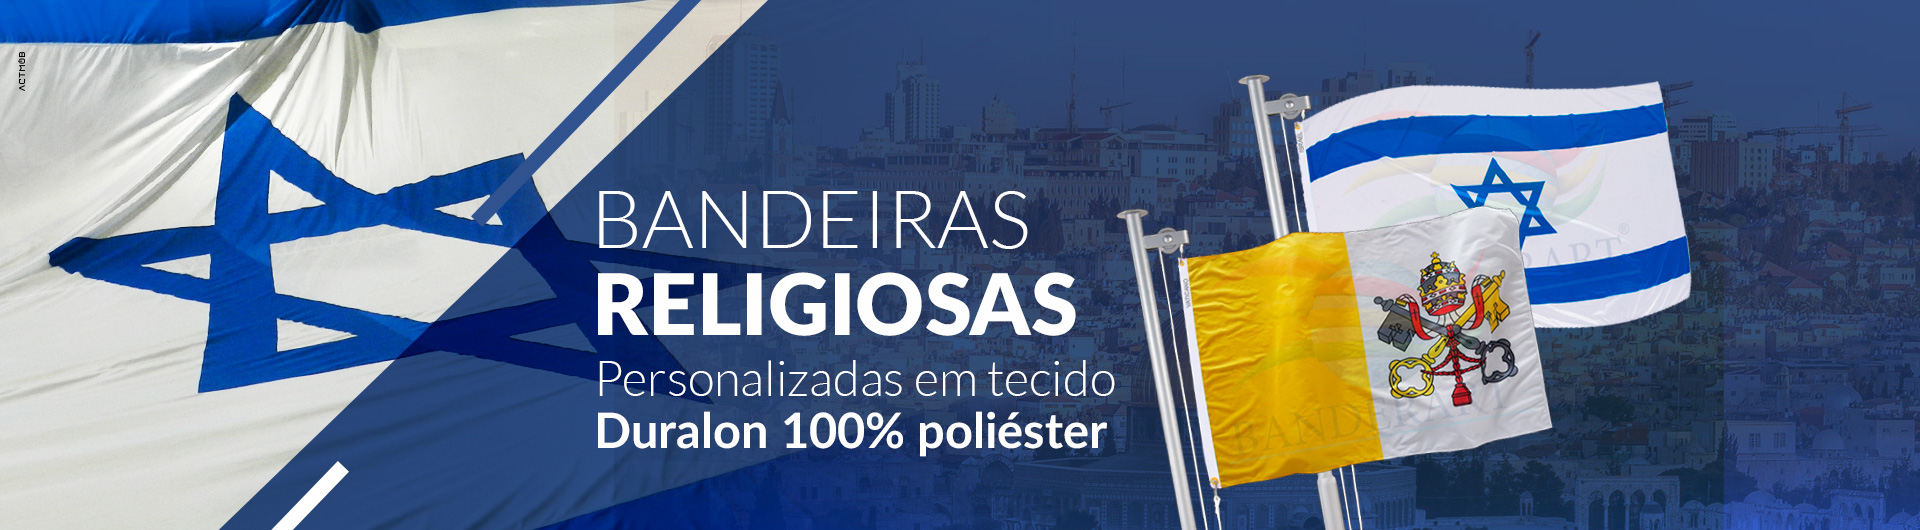 Bandeiras ReligiosasBanderart